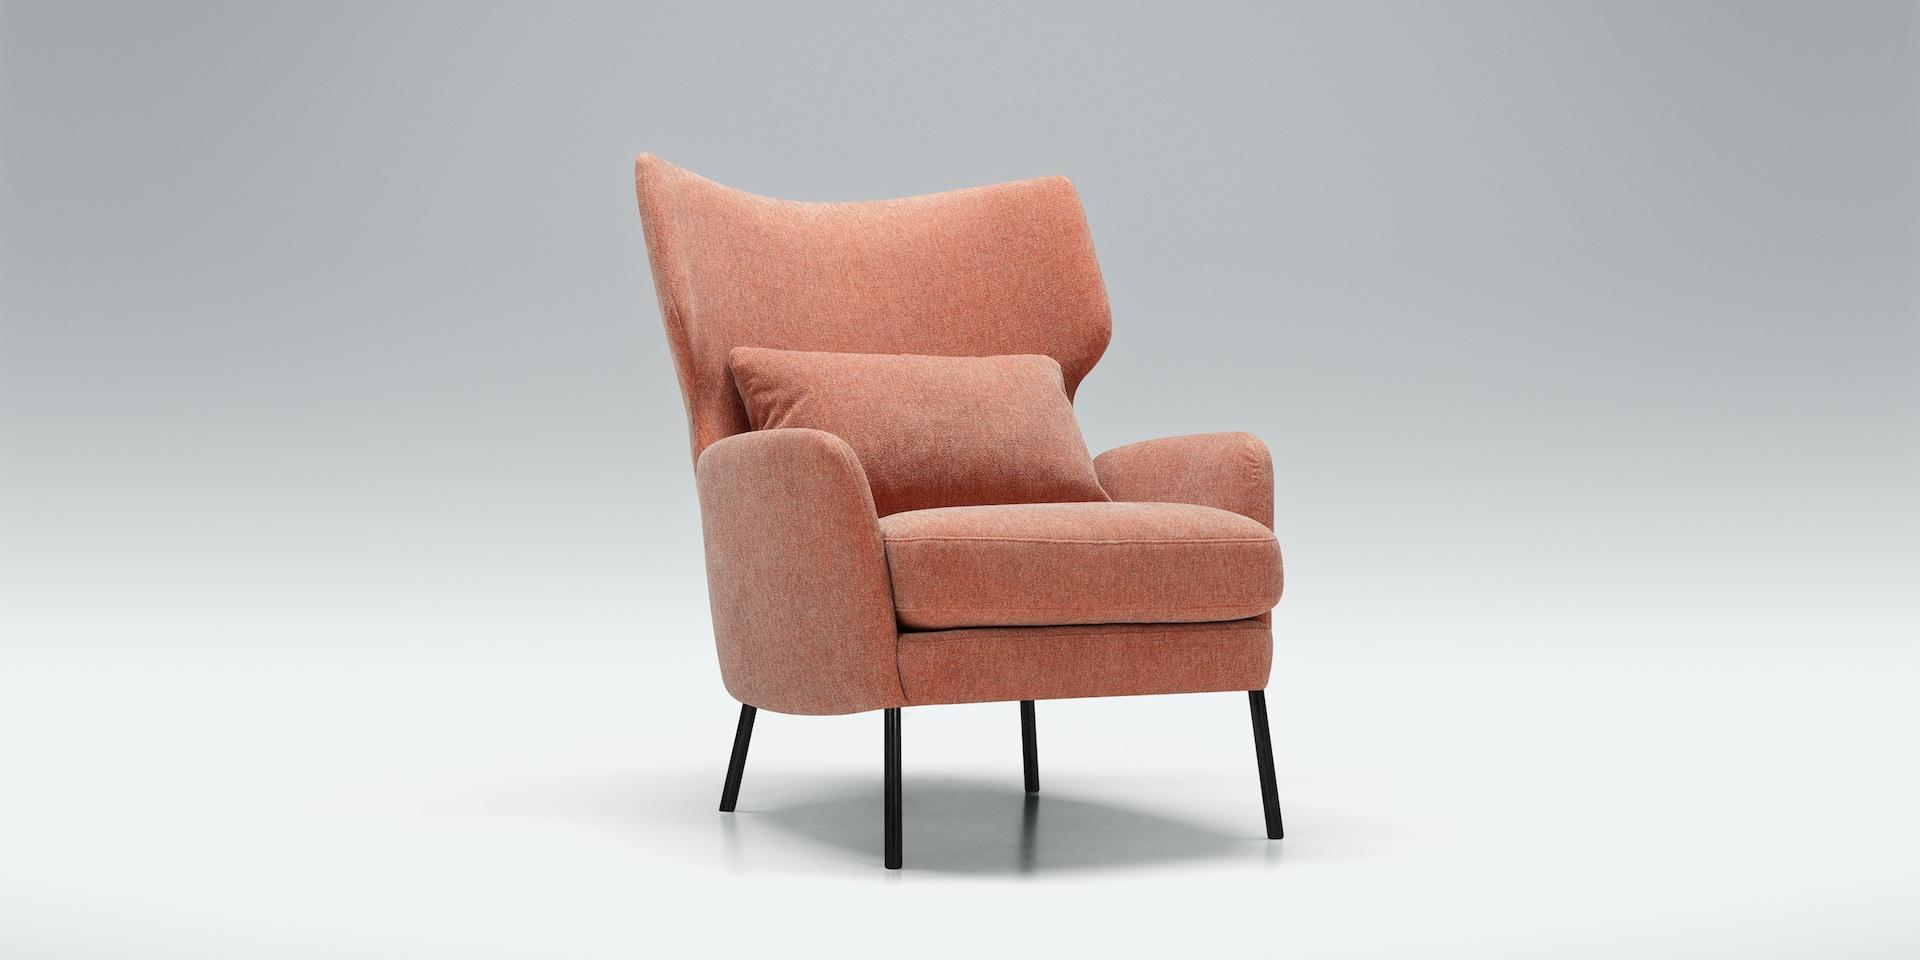 ALEX_shadow_armchair_stipa10_orange_2